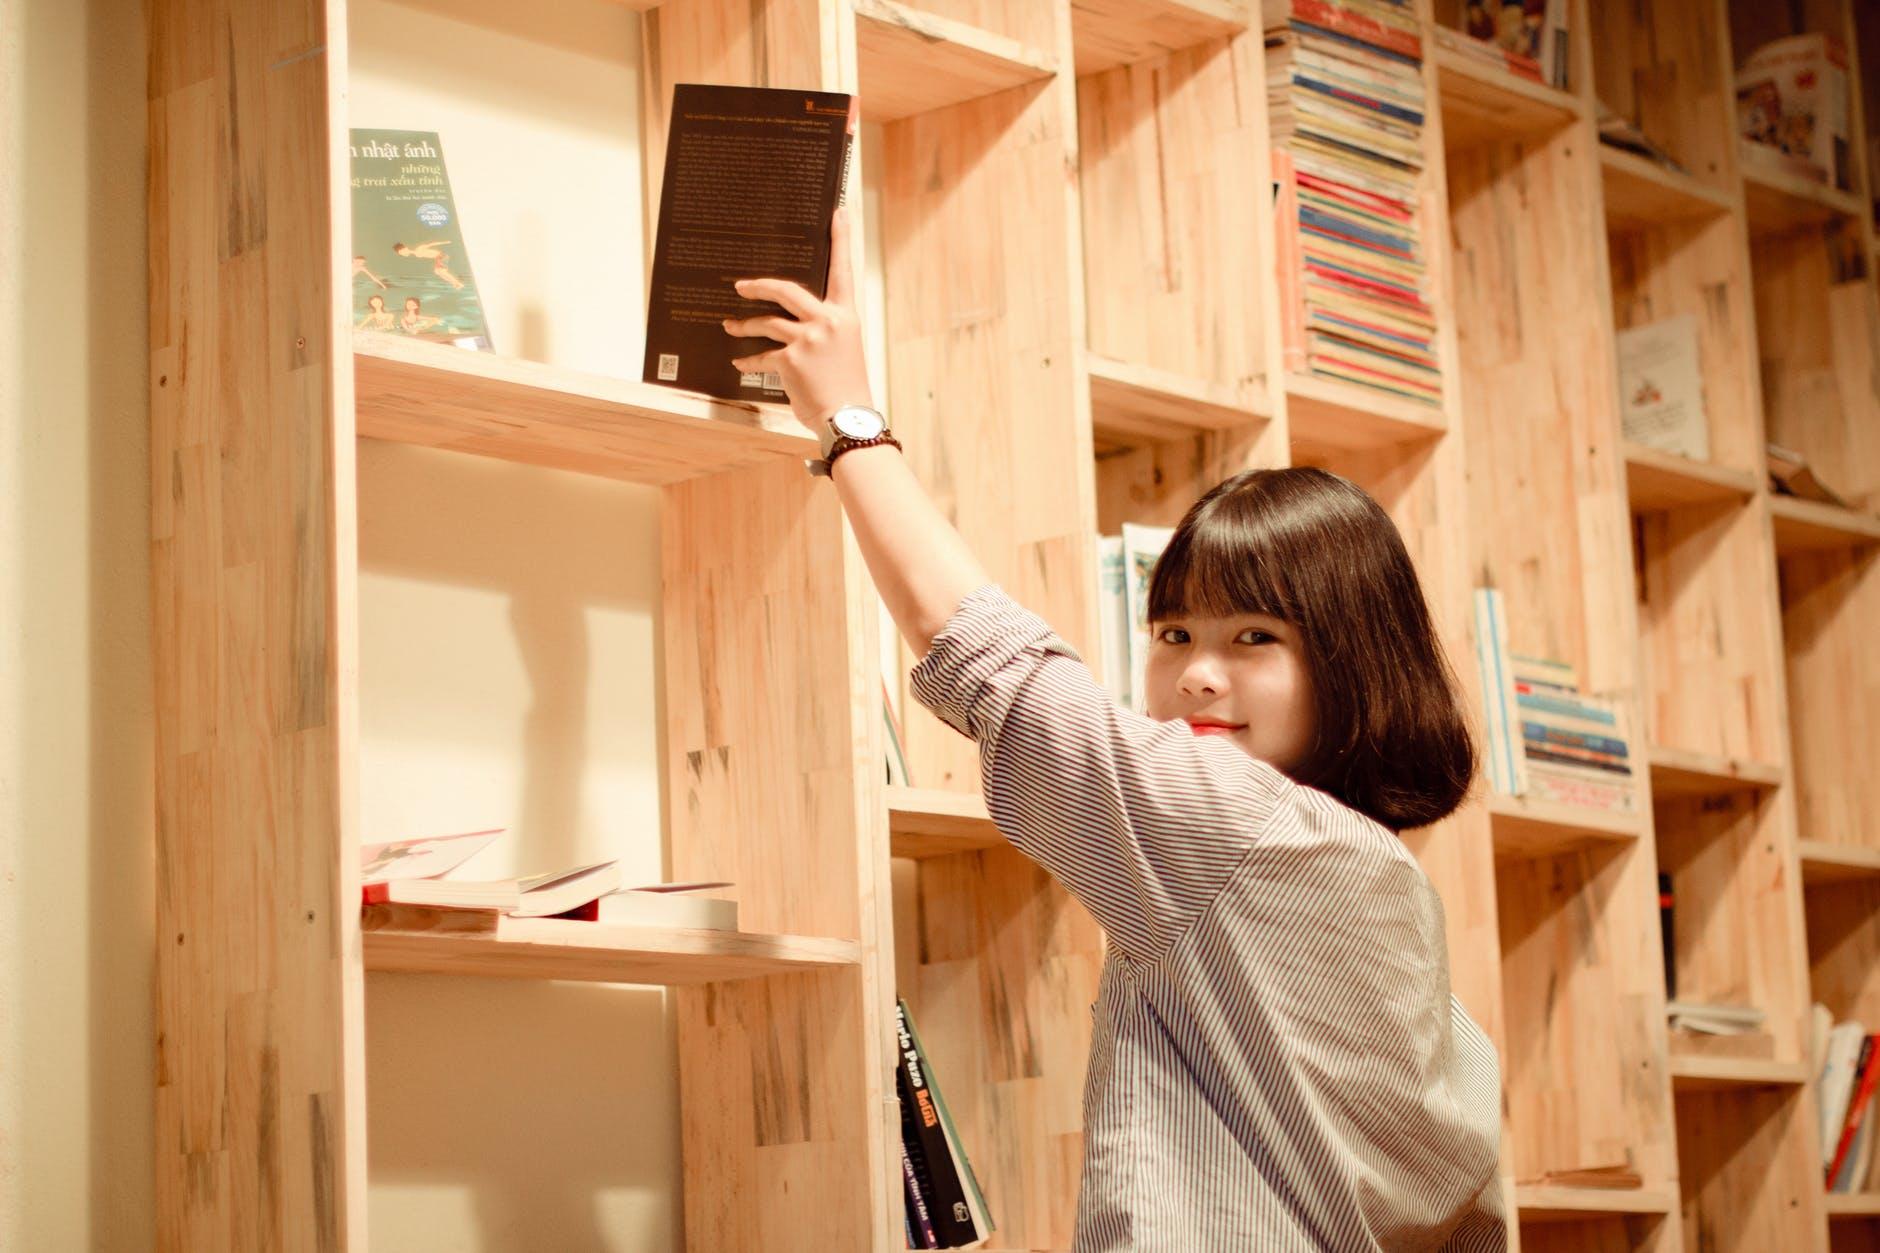 girl getting a book